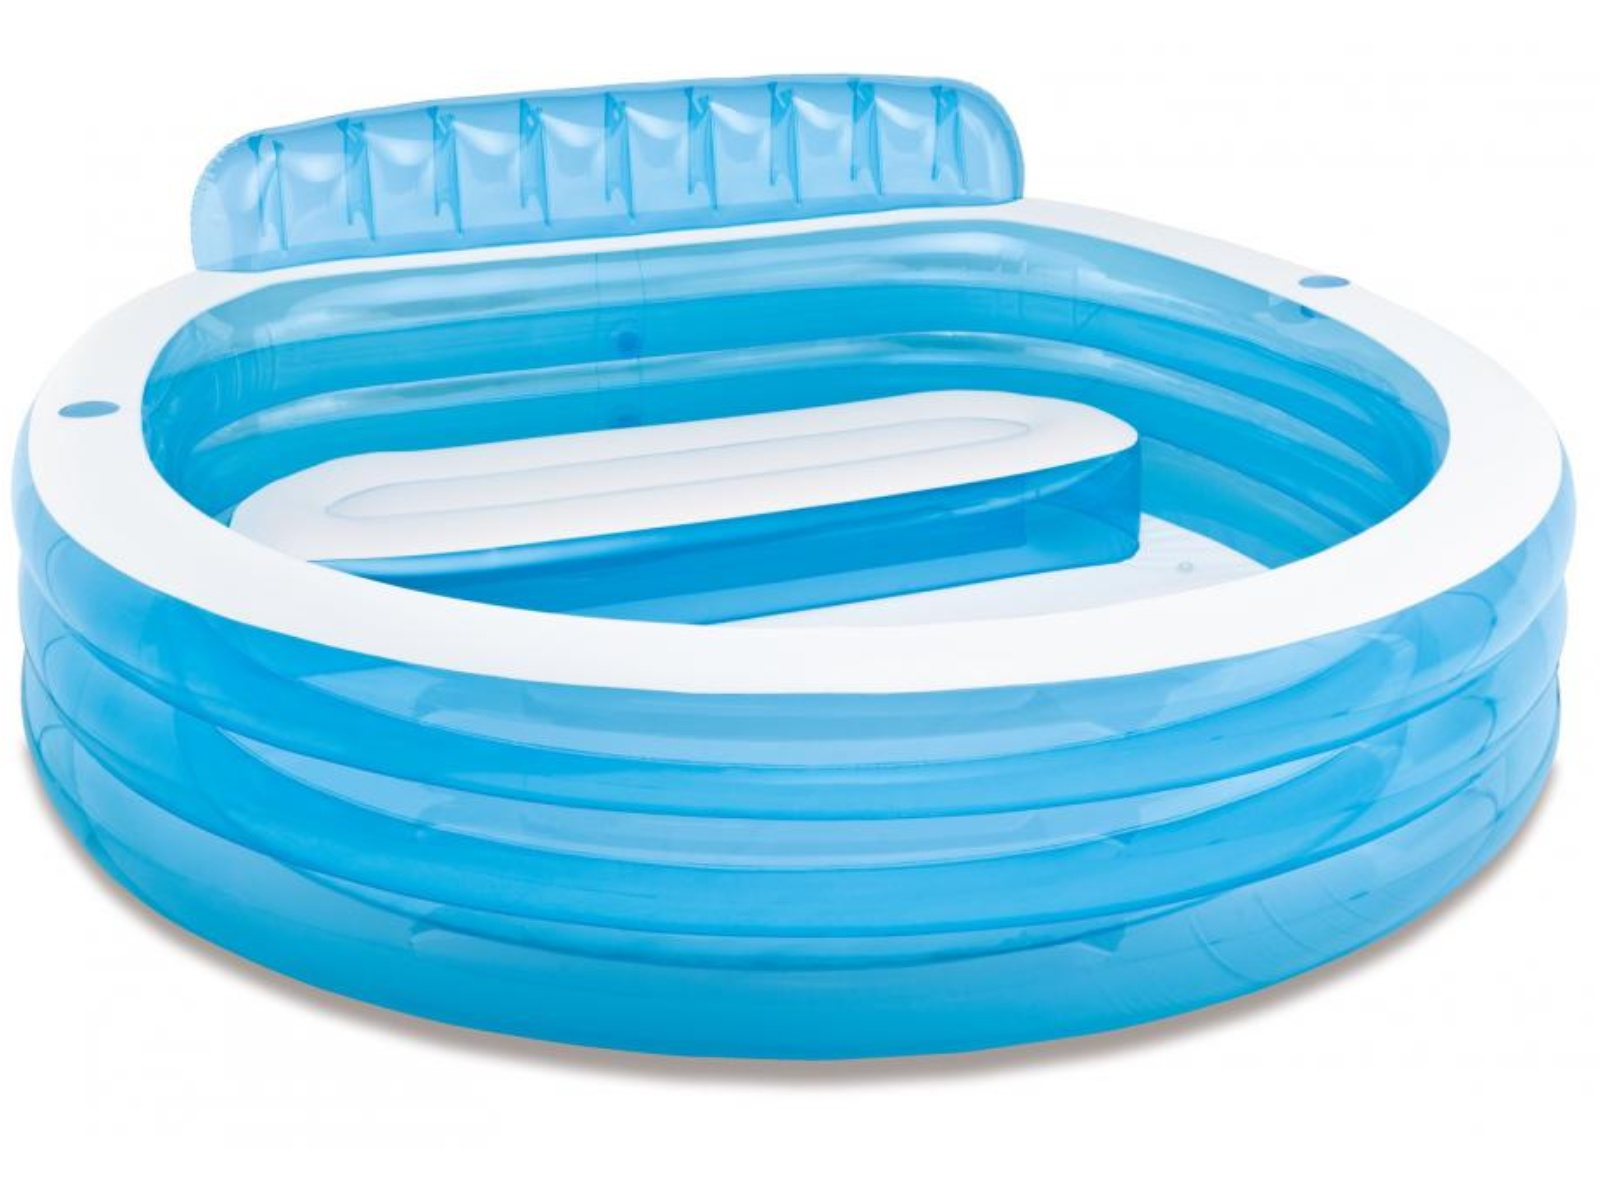 Nafukovací bazén INTEX Family Center 224 x 216 x 76 cm